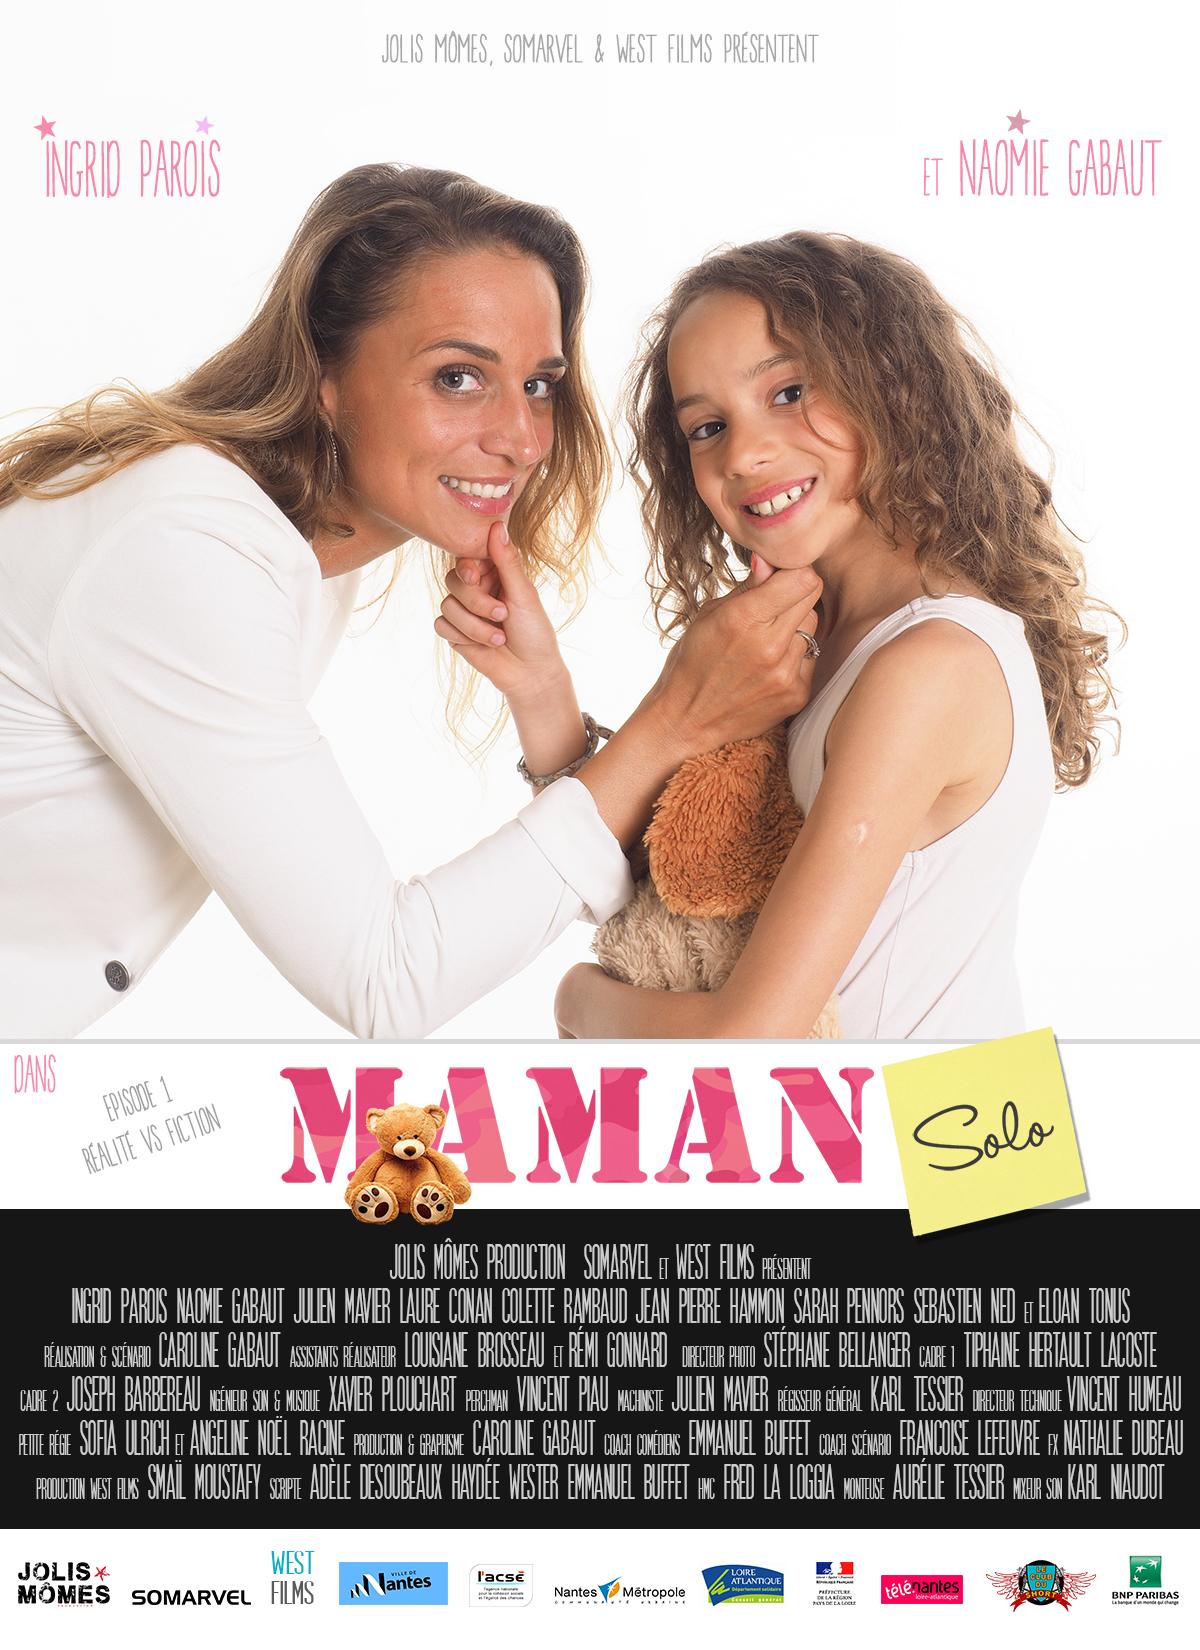 Ralit Maman - Vido Porno: Les plus populaires - Tonic